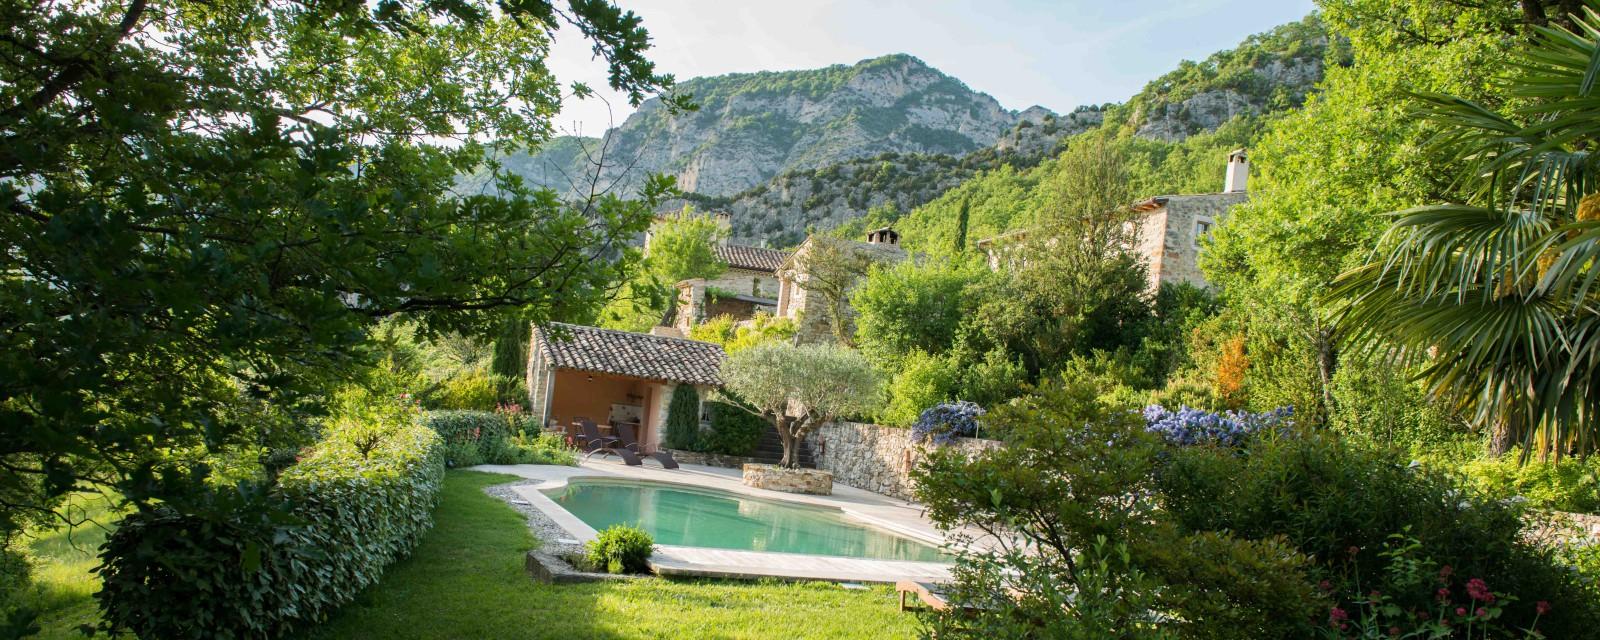 Jardin piscine maison hotes provence